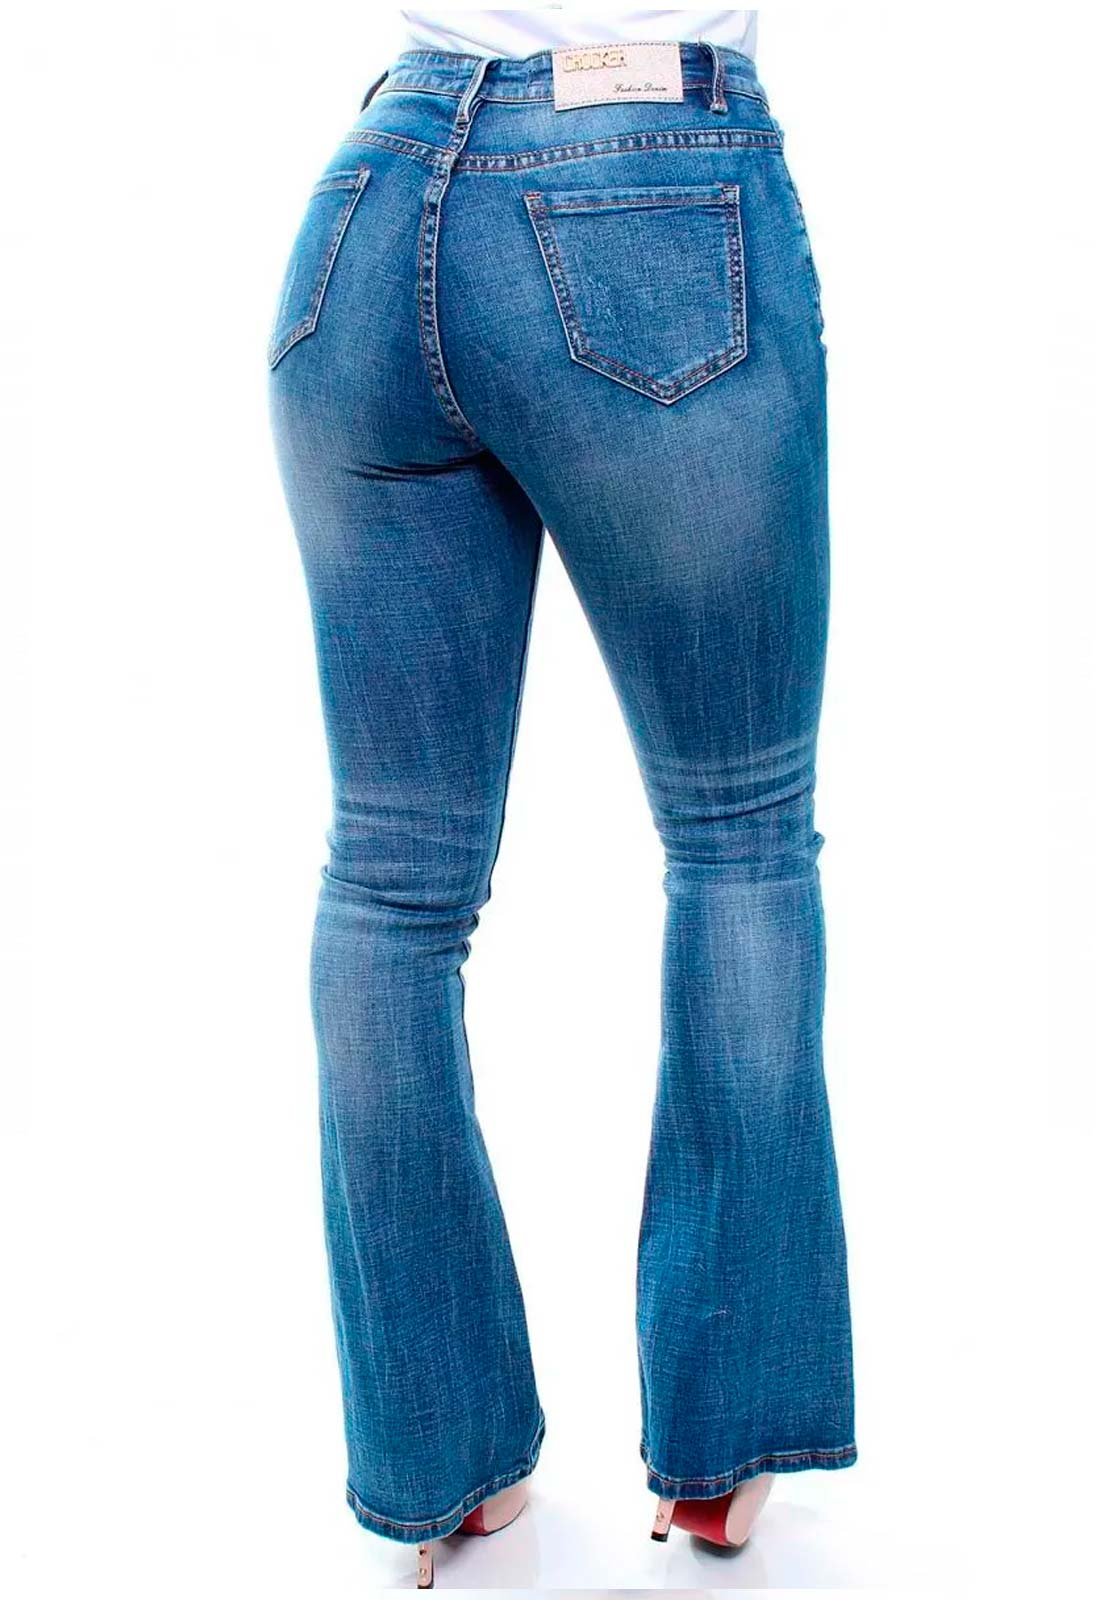 Calça Jeans Feminina Flare Crocker - 46406  - CROCKER JEANS